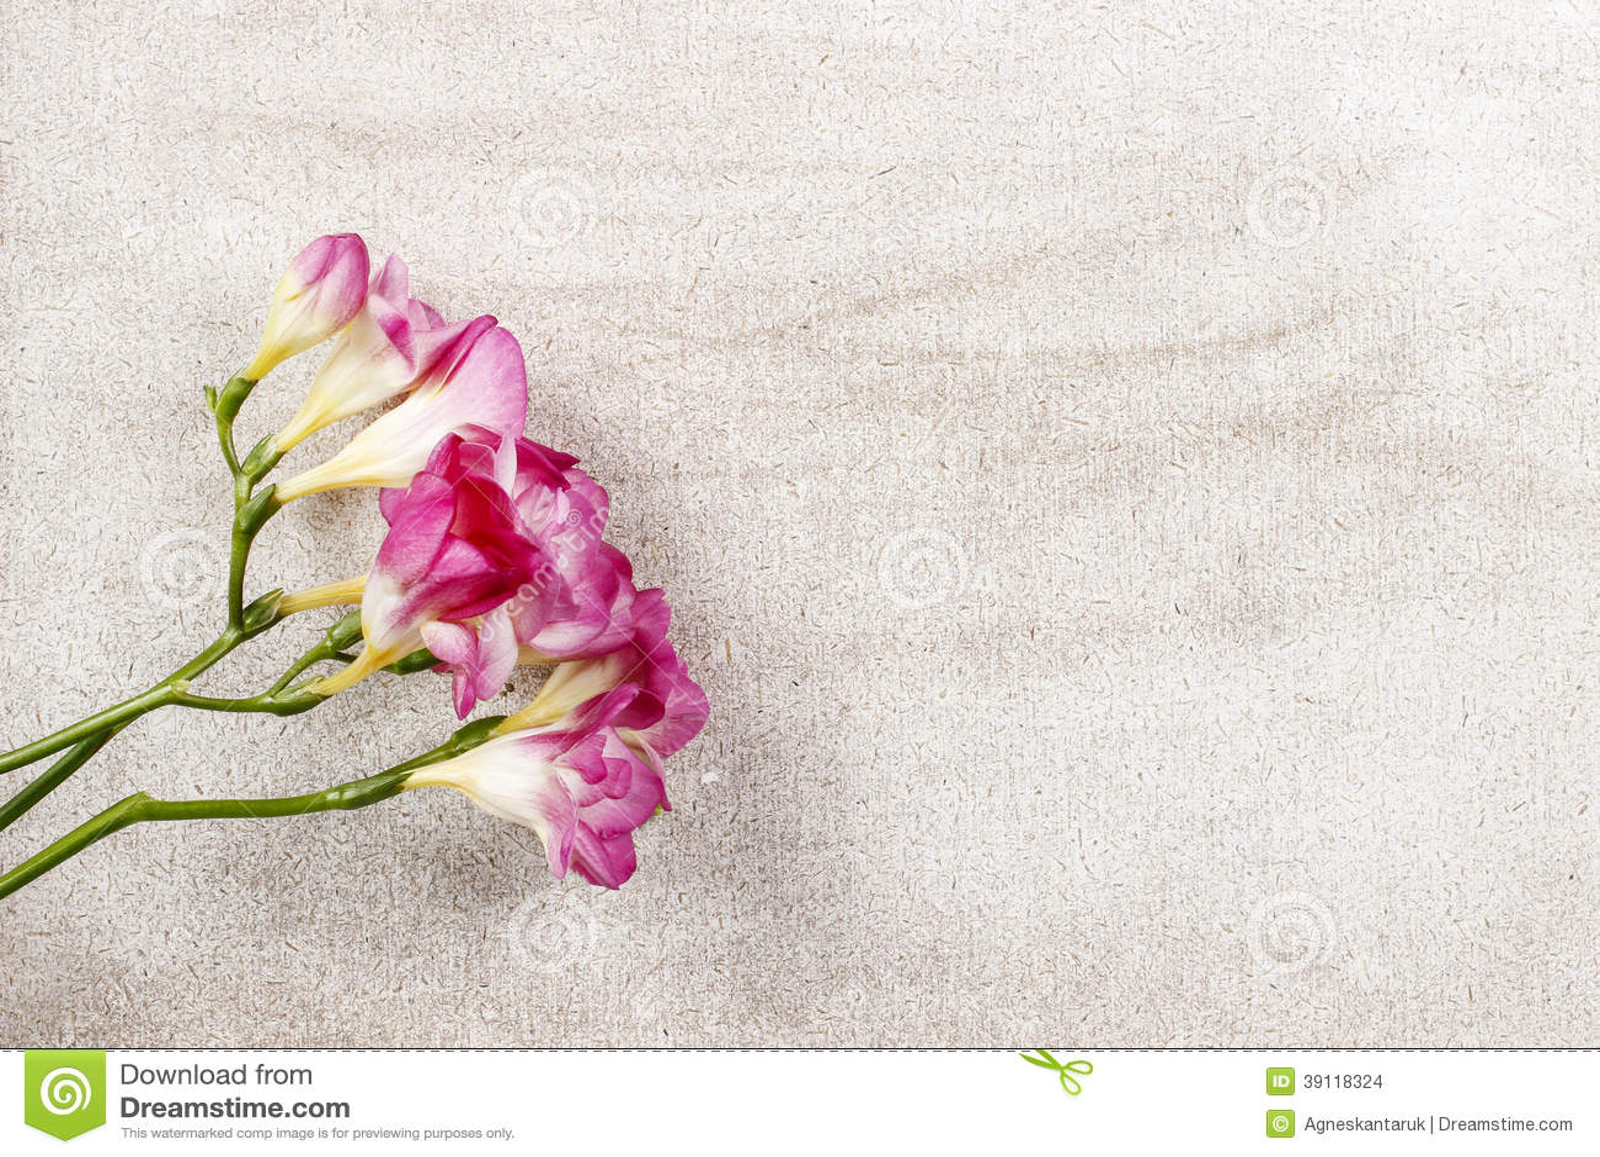 Pink freesia flowers on wooden background stock photo 39118324 pink freesia flowers on wooden background stock photo 39118324 megapixl mightylinksfo